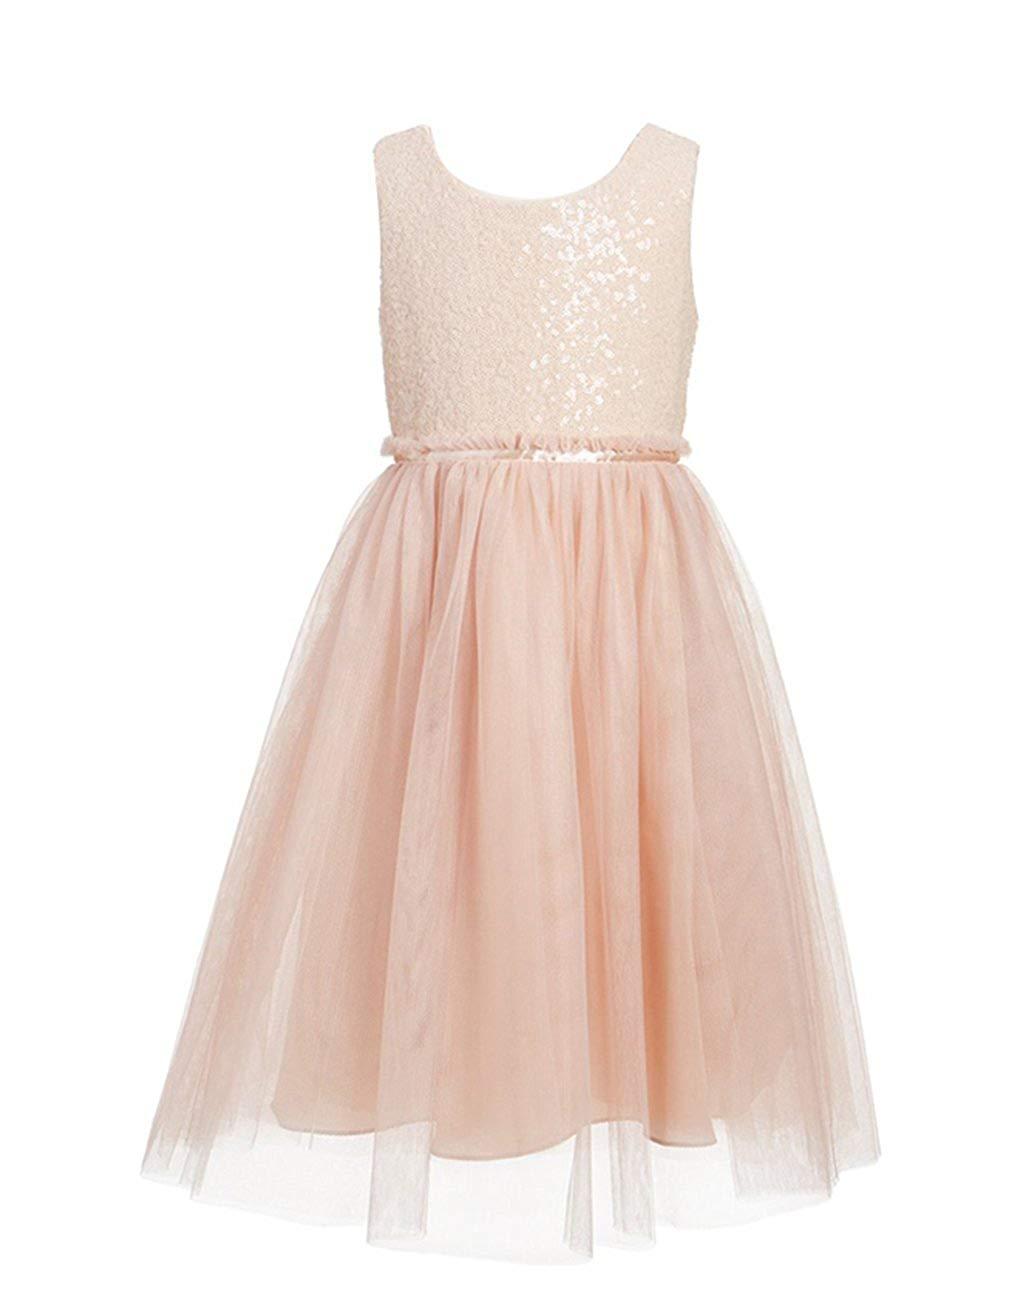 119944ea289 Get Quotations · princhar Blush Sequin Tulle Flower Girl Dress Wedding  Party Toddler Dress for Kids